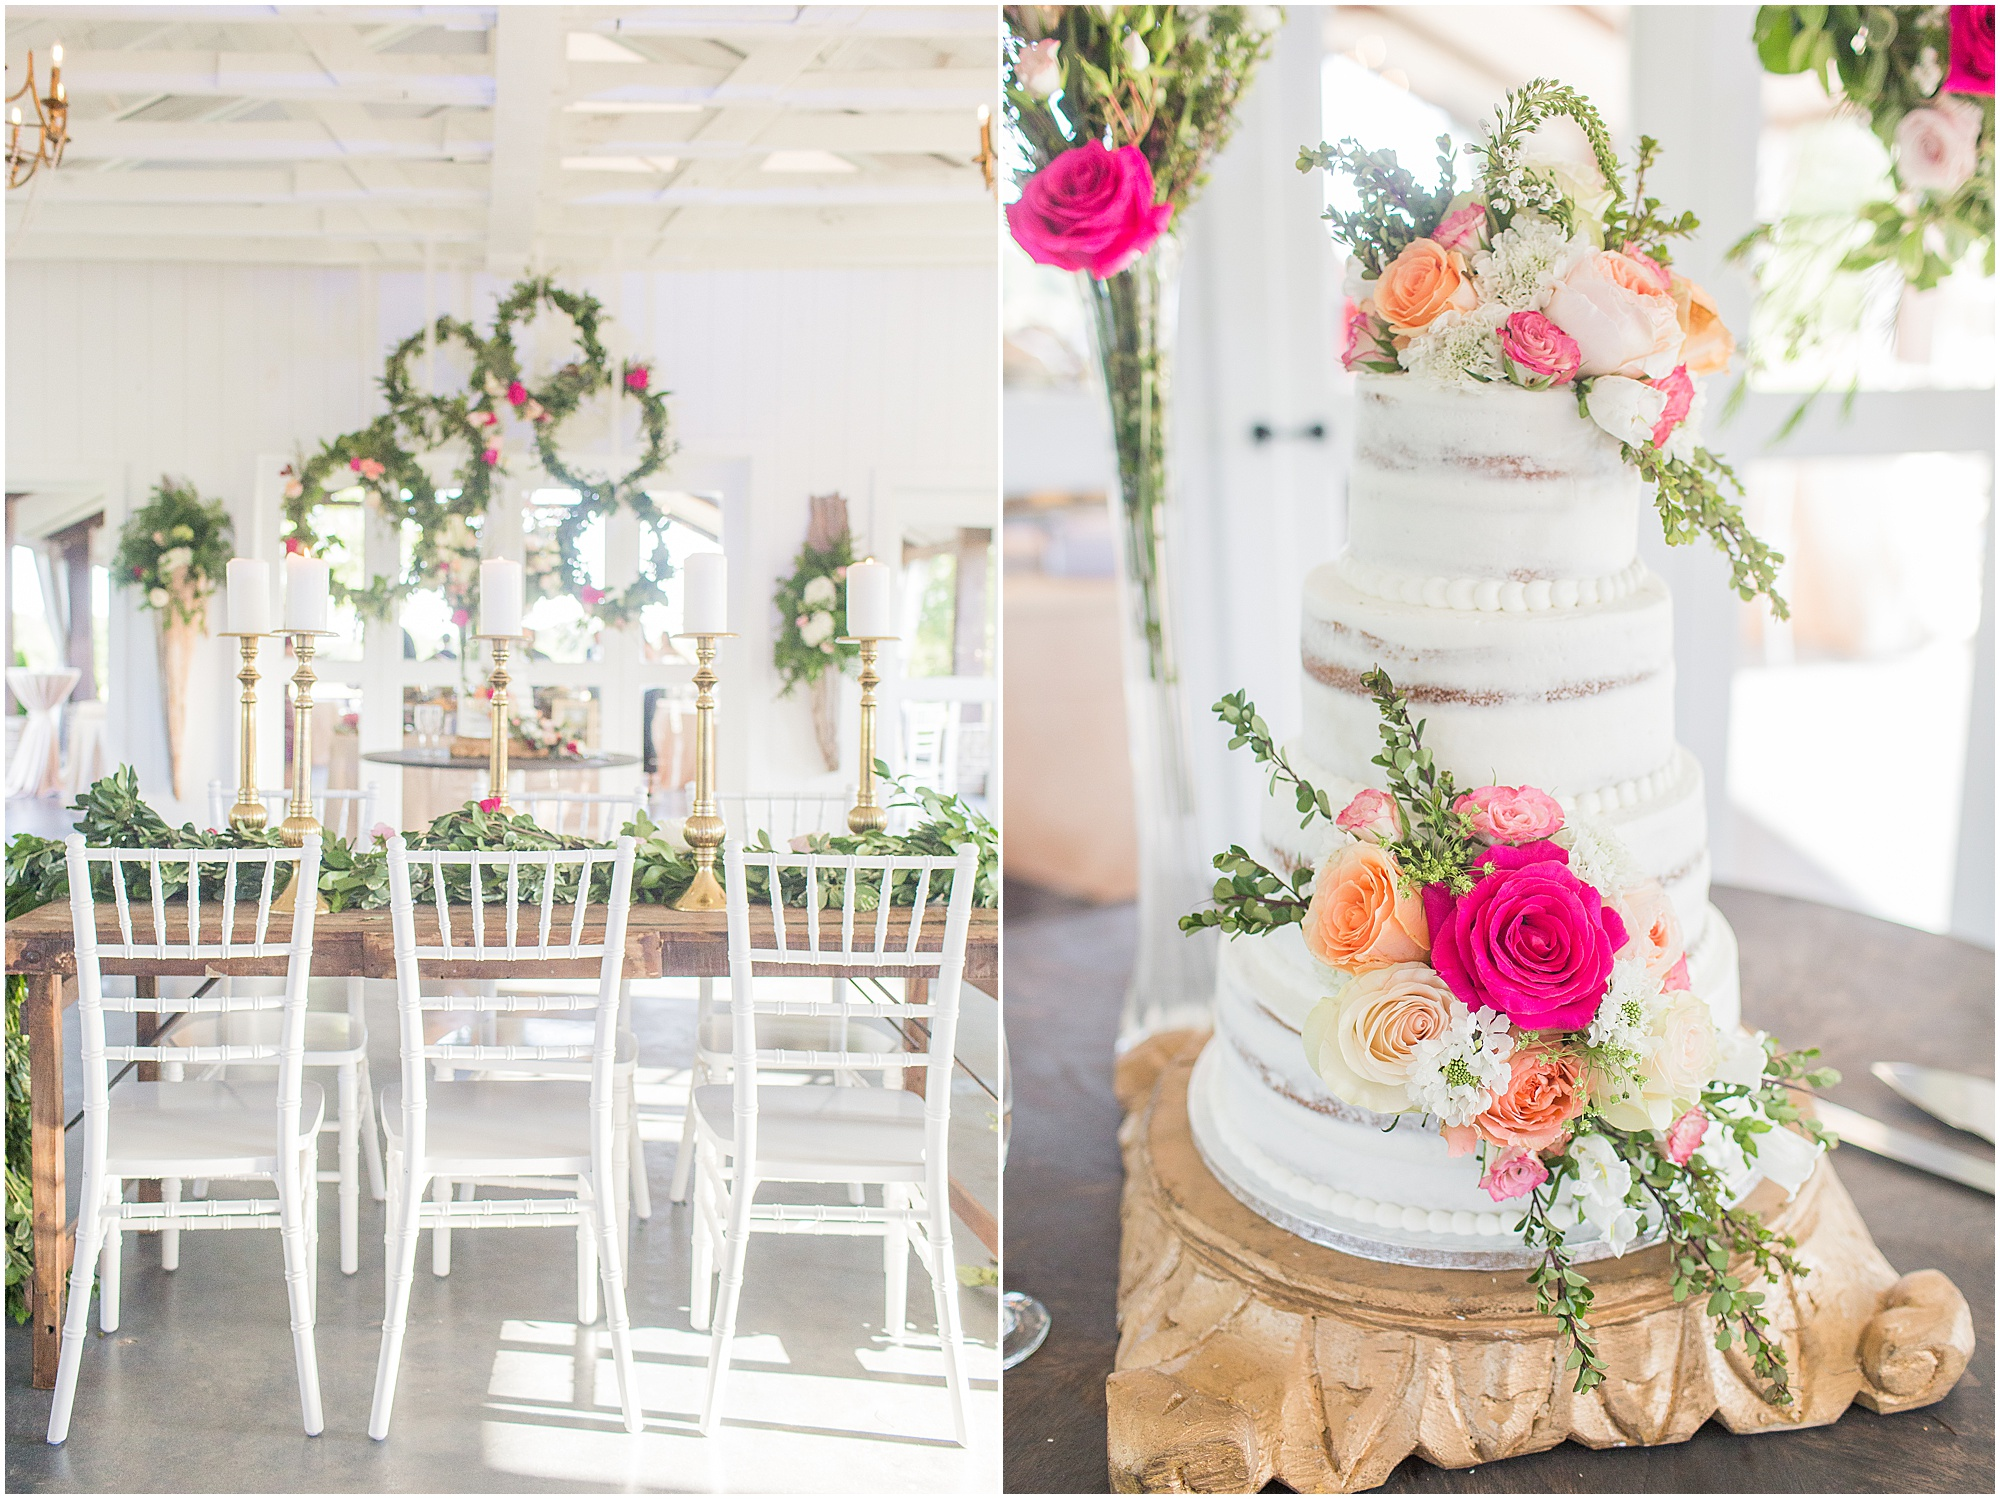 starkville-mississippi-wedding-page-place-dodson-farms_0068.jpg